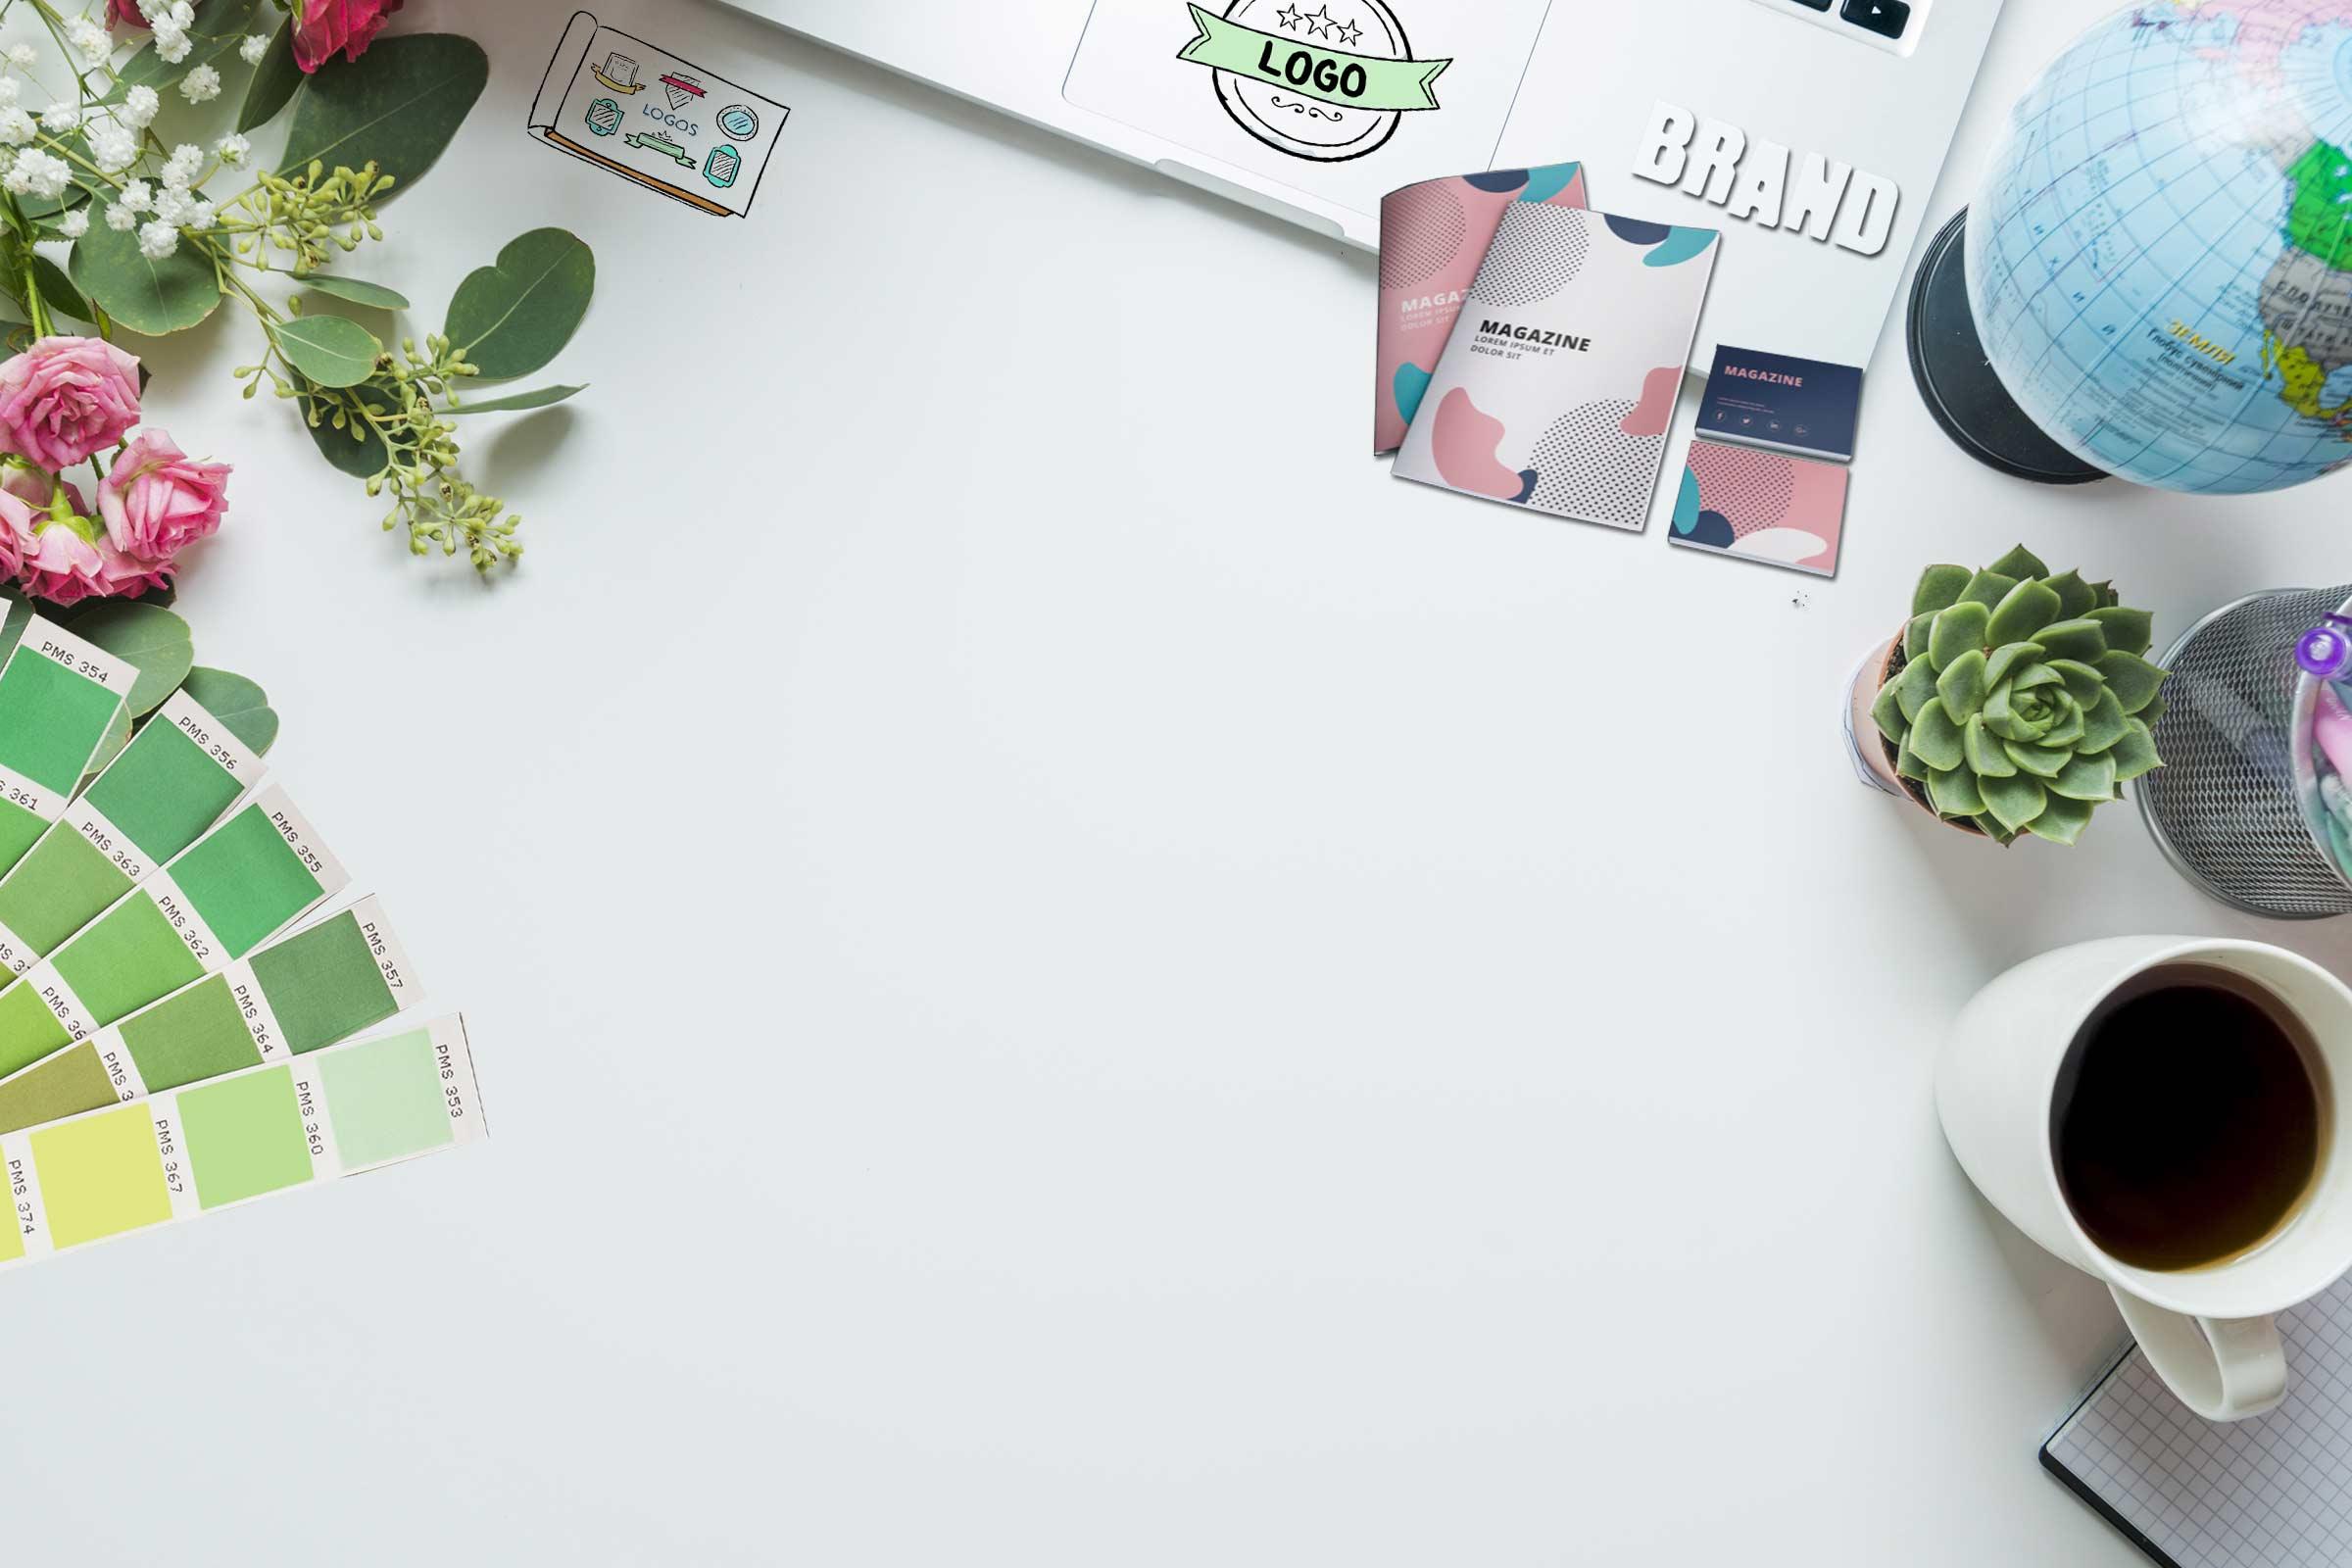 Laptop surranded by print design images